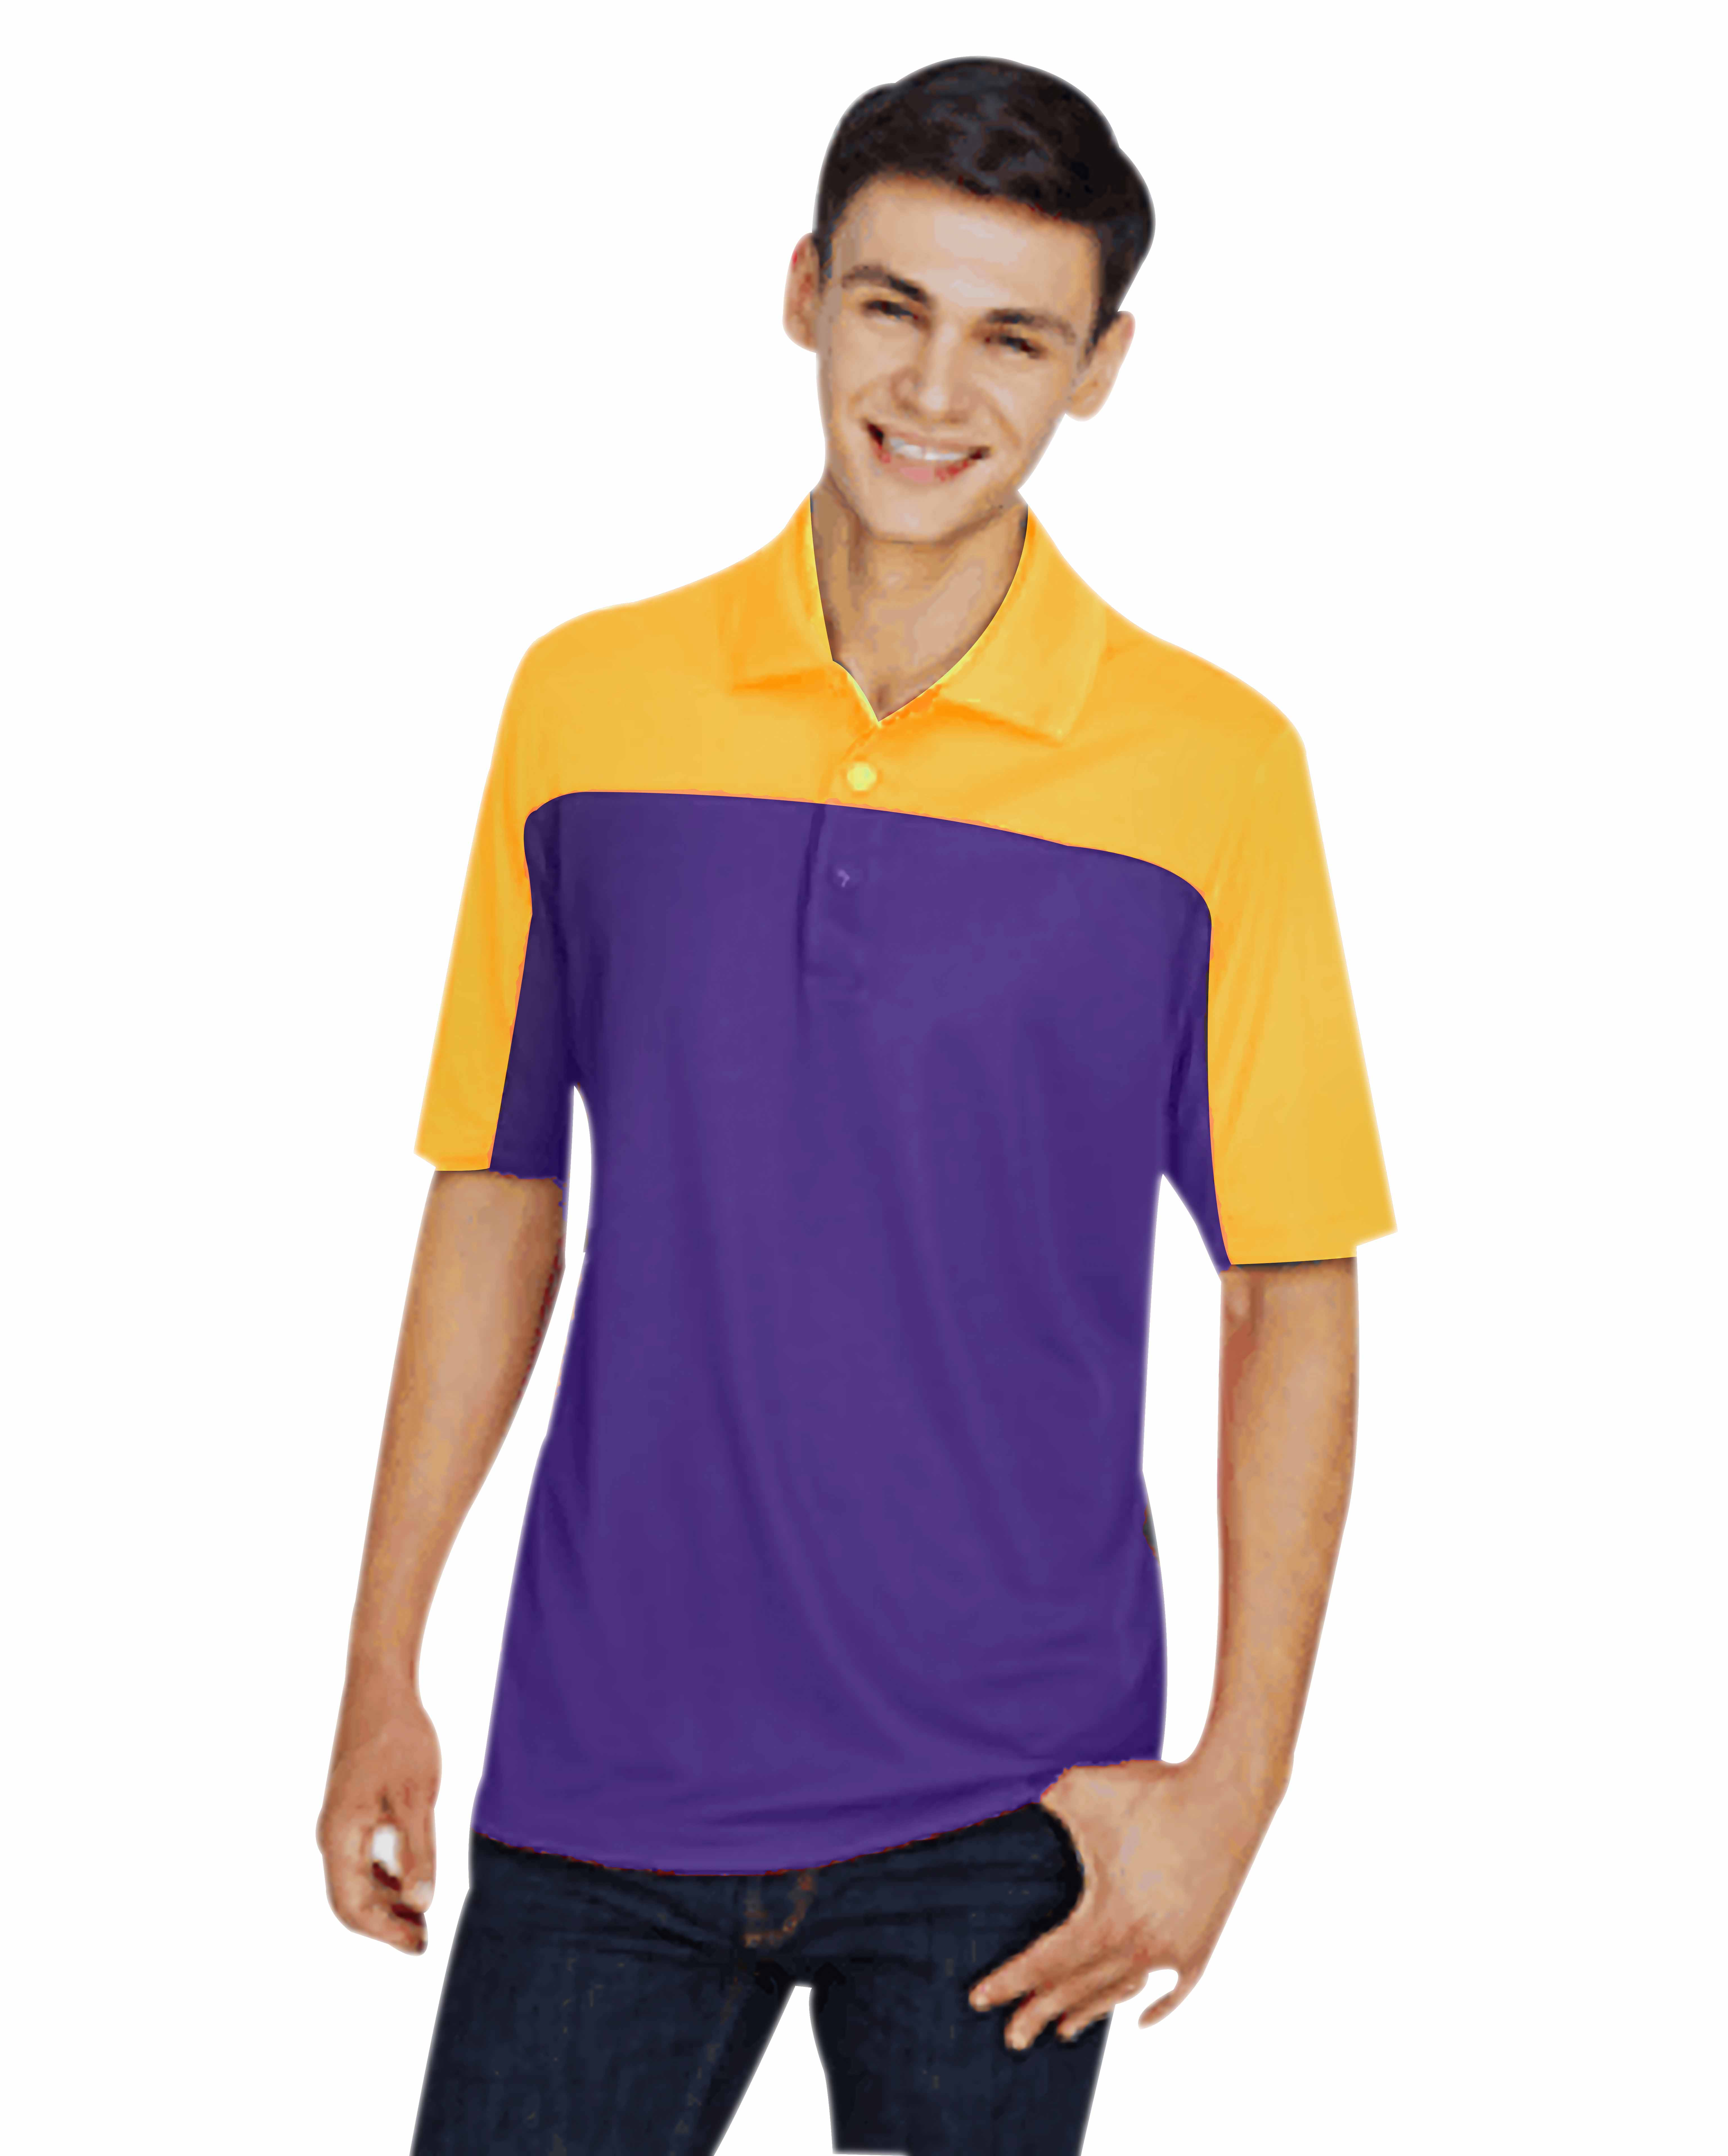 Short Sleeve Activity Advertising POLO T Shirt Customization